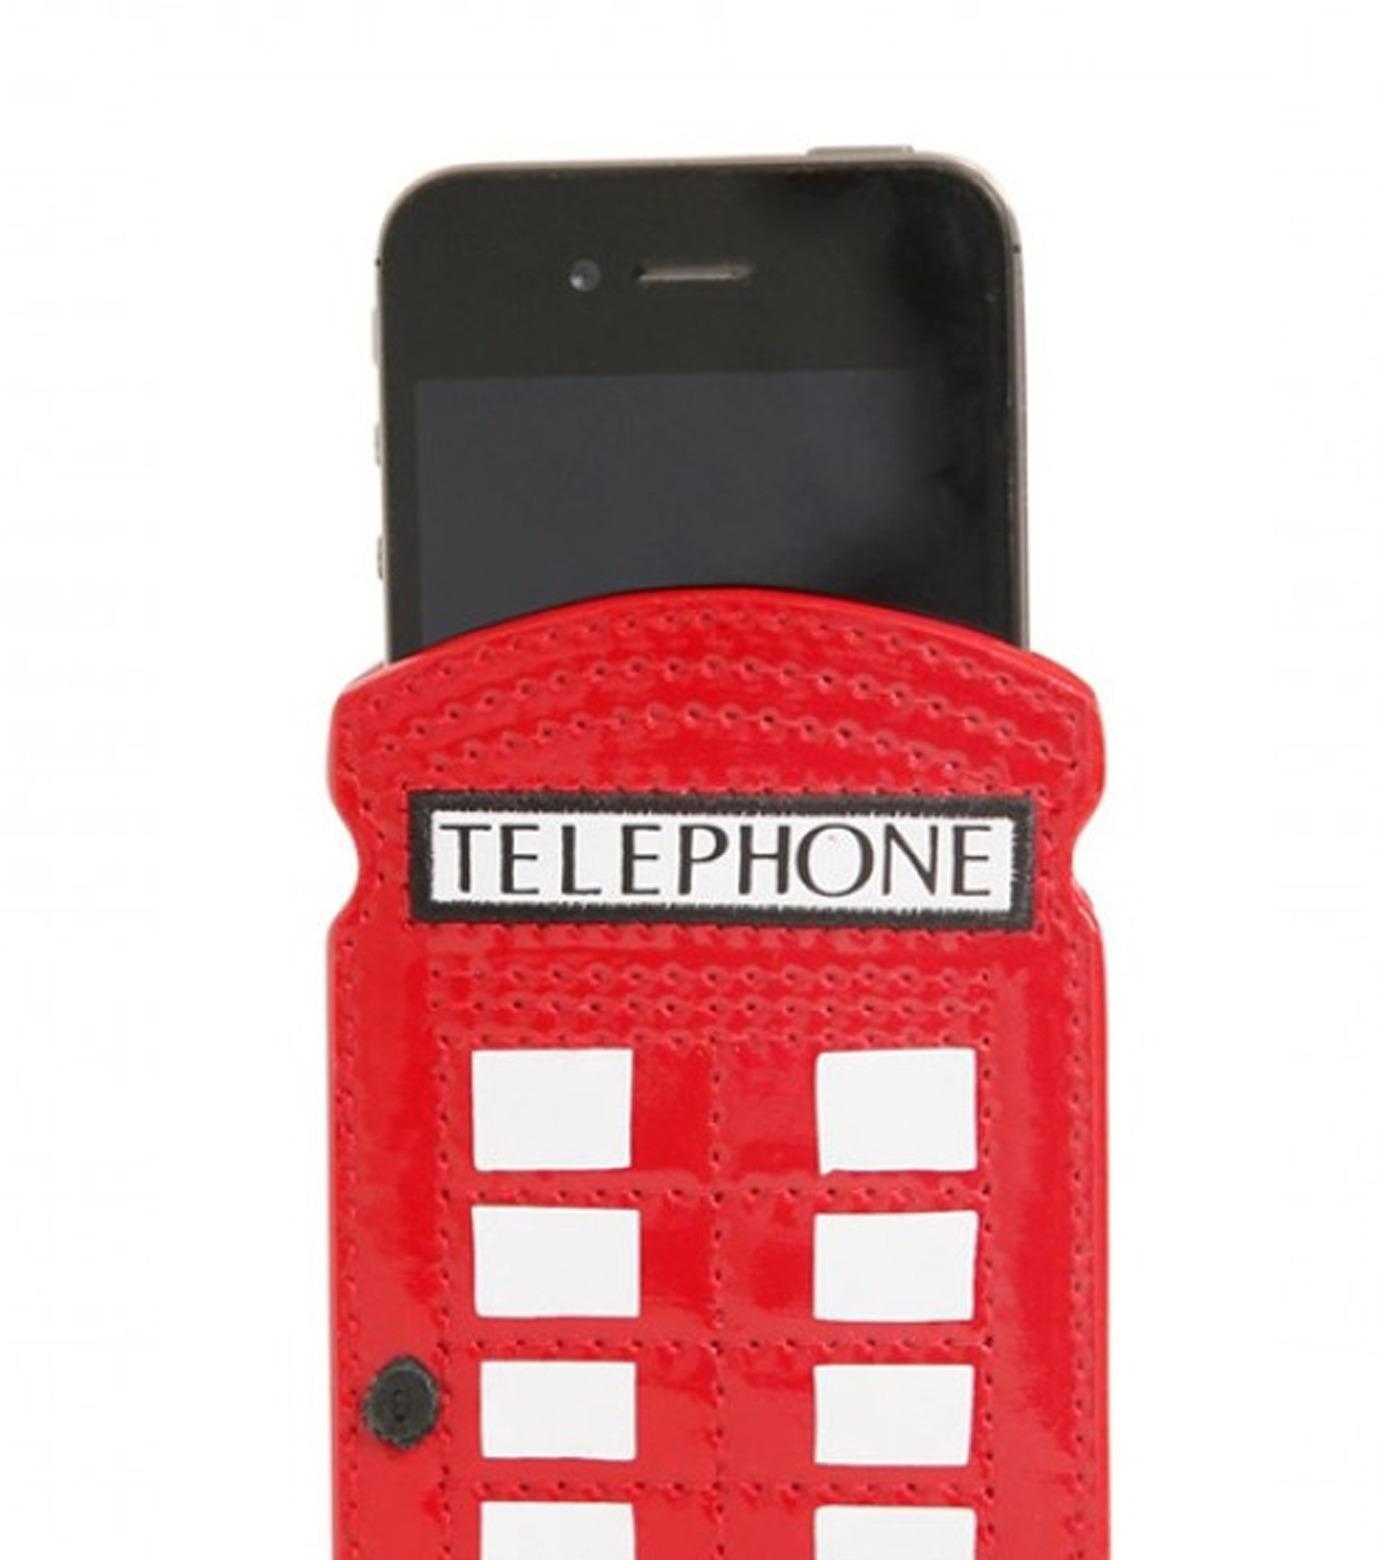 Lulu Guinness(ルル・ギネス)のTelephone Box Phone Holder-RED(ケースiphone5/5s/se/case iphone5/5s/se)-50003235-62 拡大詳細画像3